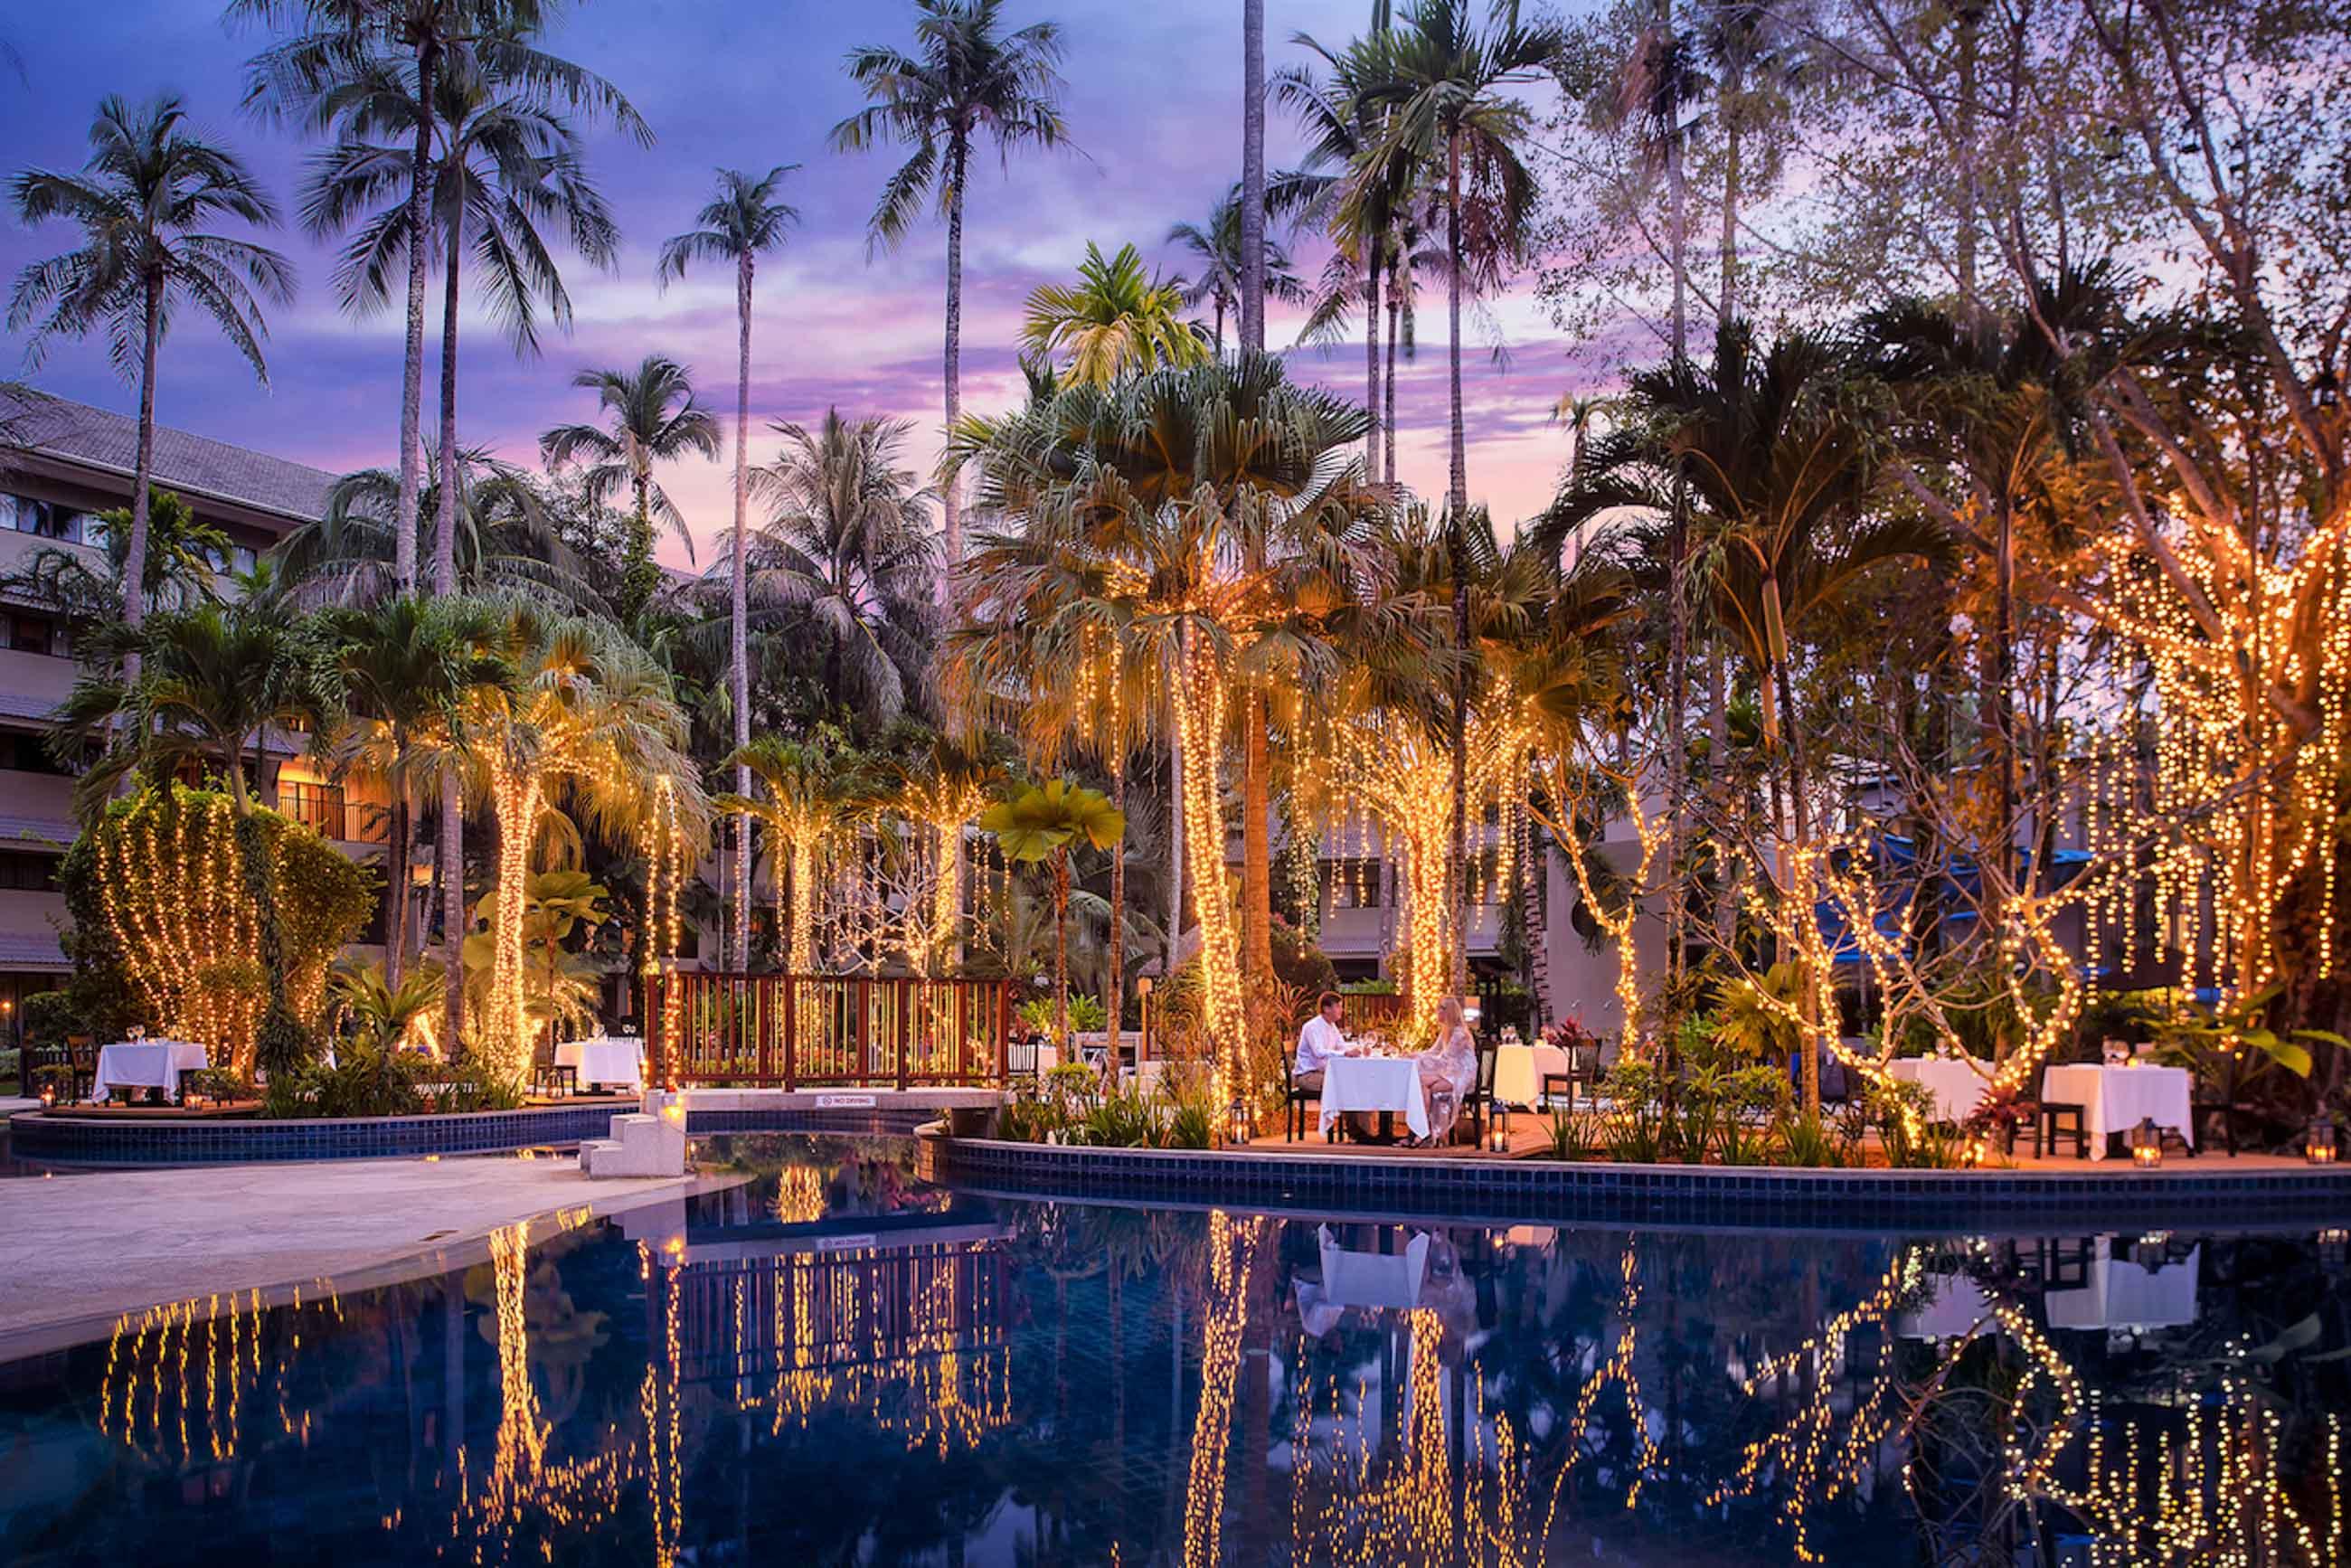 https://bubo.sk/uploads/galleries/7404/novotel-phuket-surin-beach-resort-evening-dinner.jpg